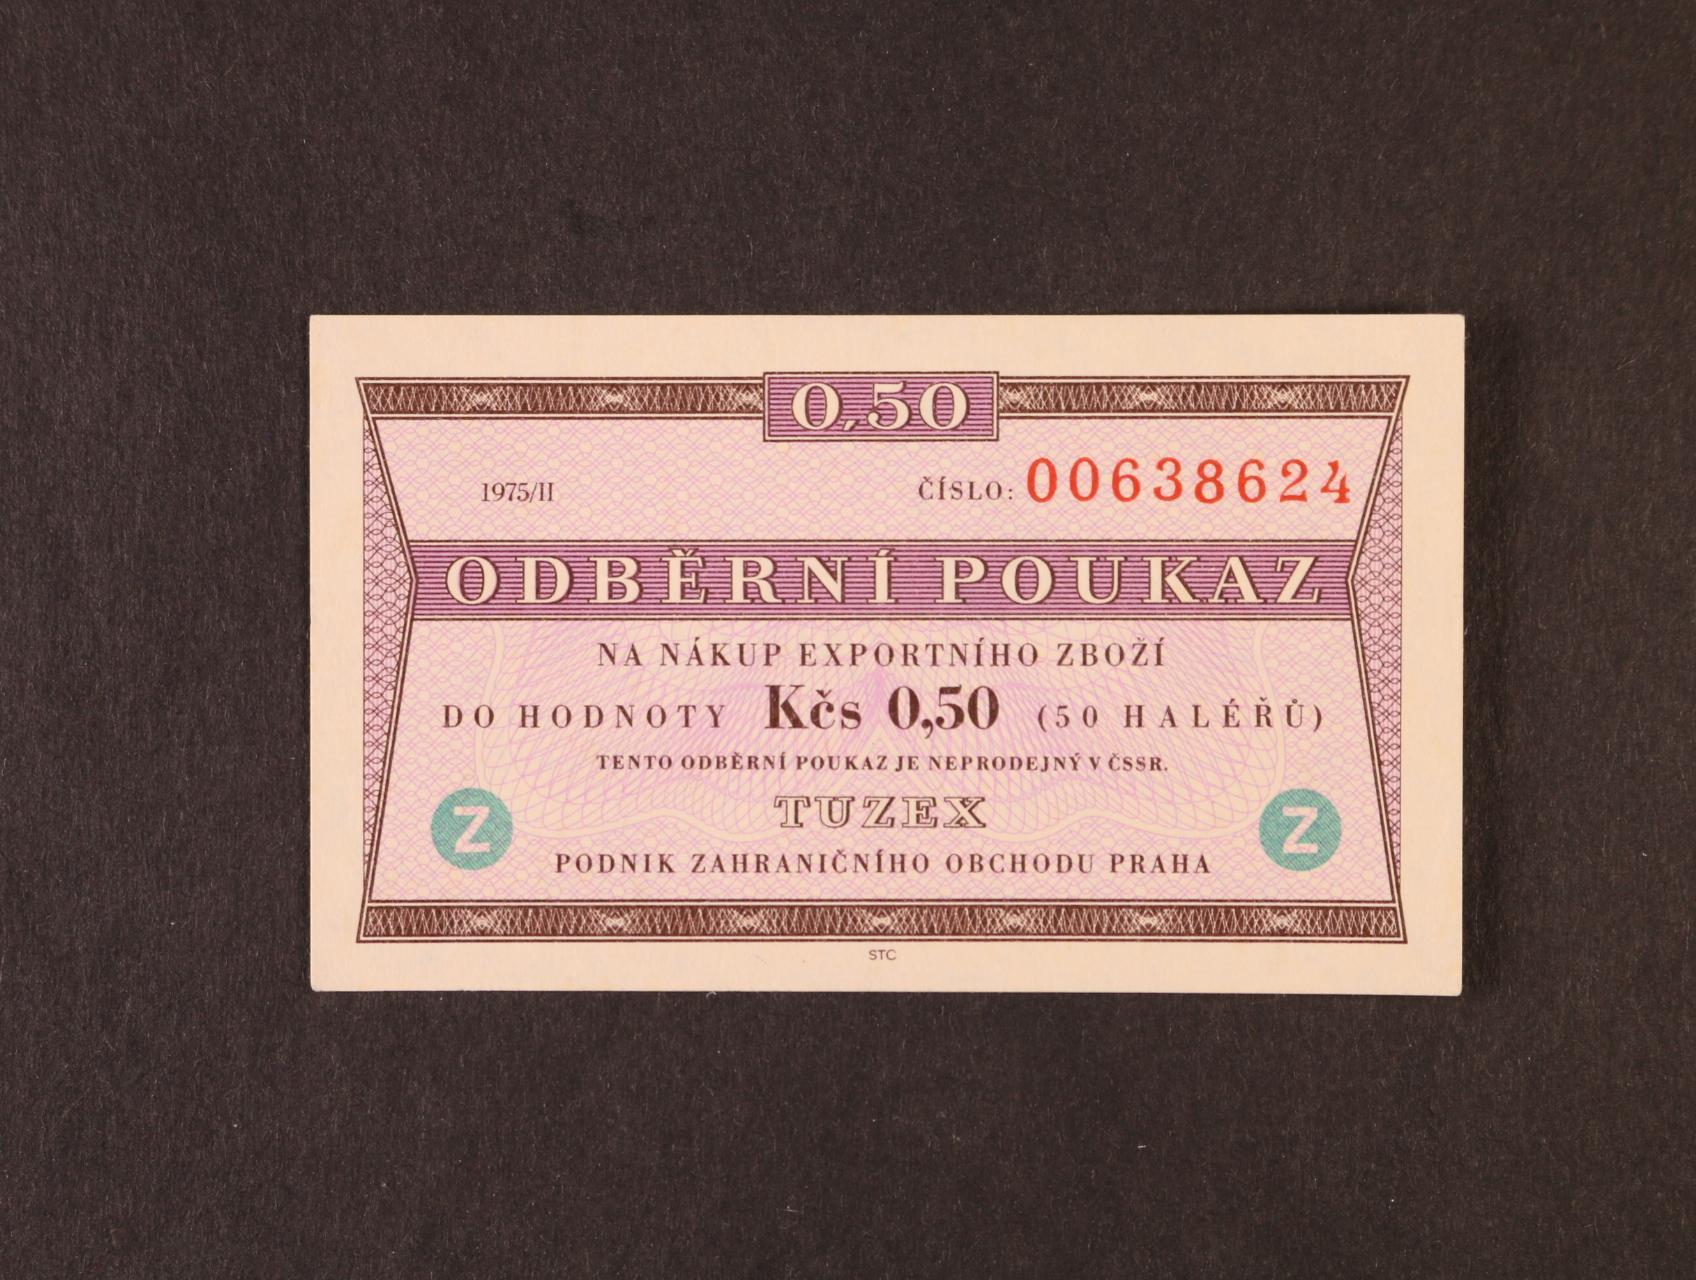 Tuzex, 0,50 TKčs s datem 1975/II